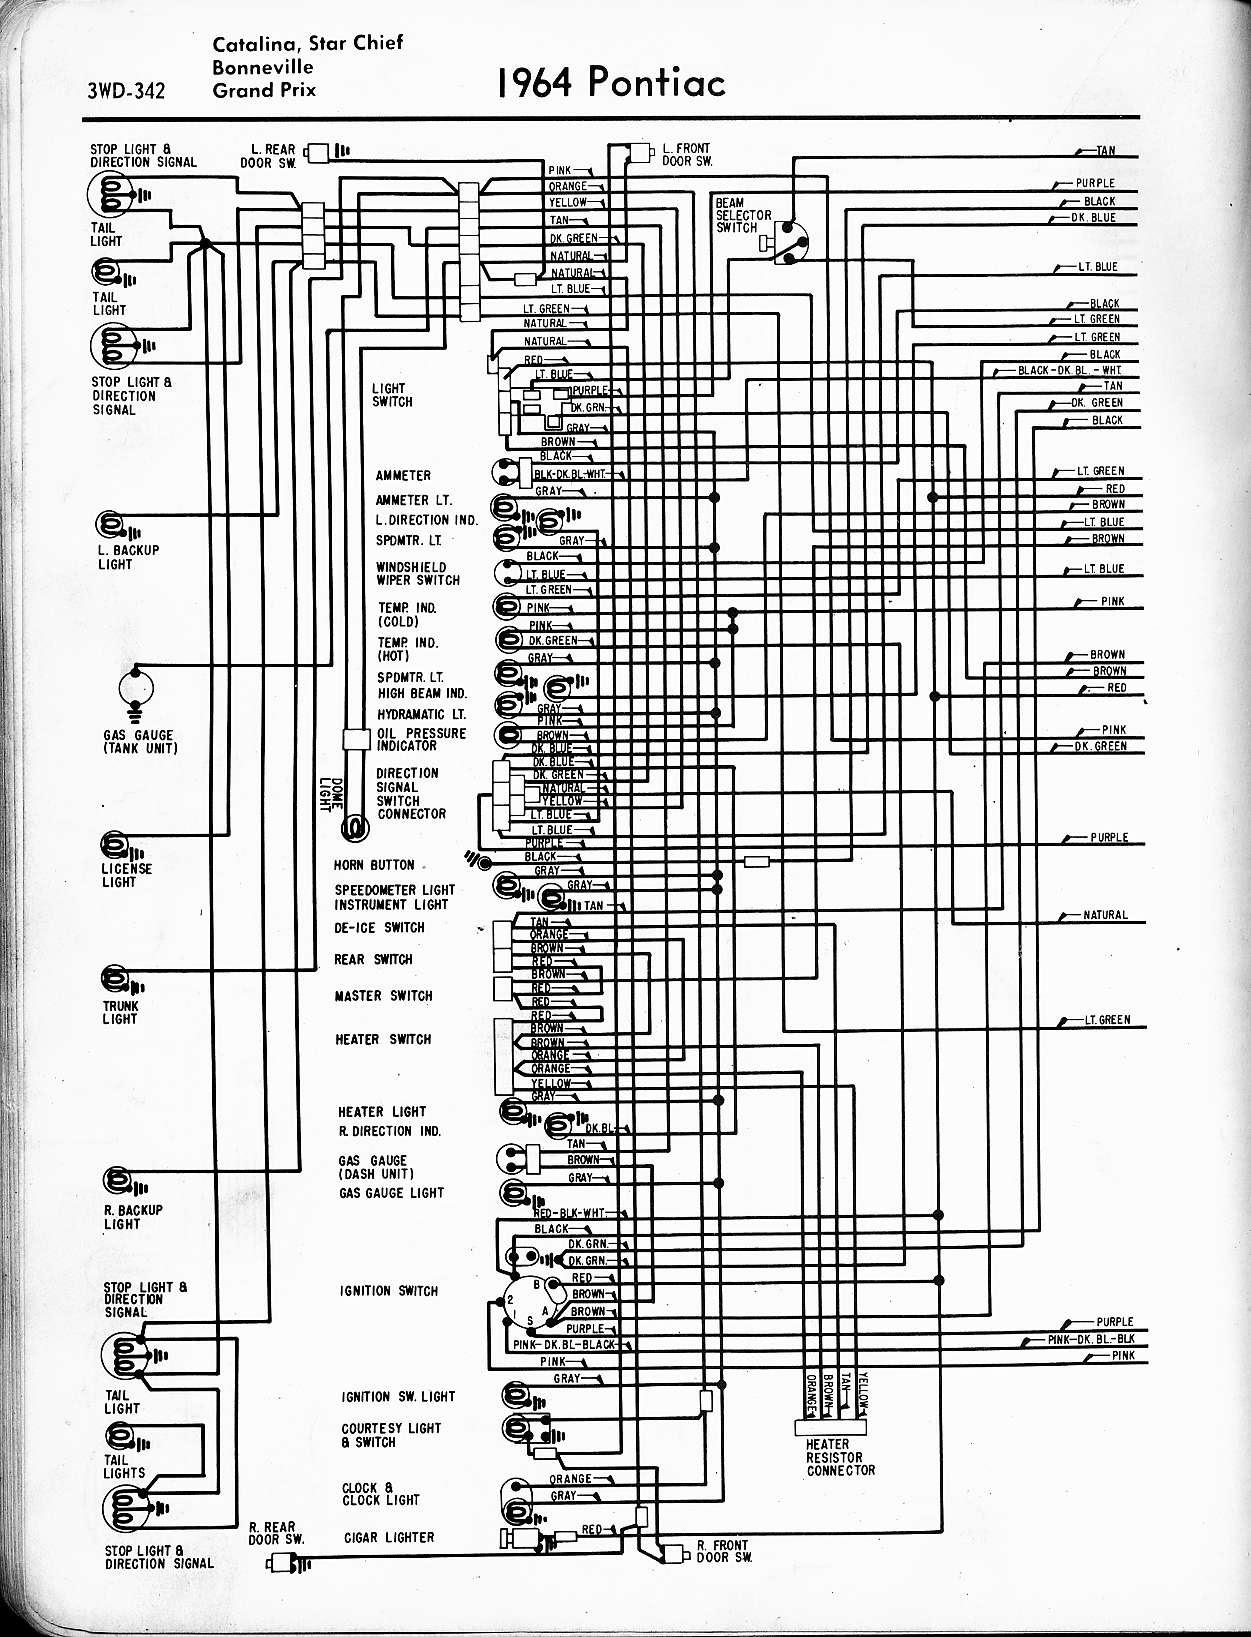 Pontiac Bonneville Radio Wiring Harnes | 97 Pontiac Bonneville Wiring Diagram |  | Fuse Wiring